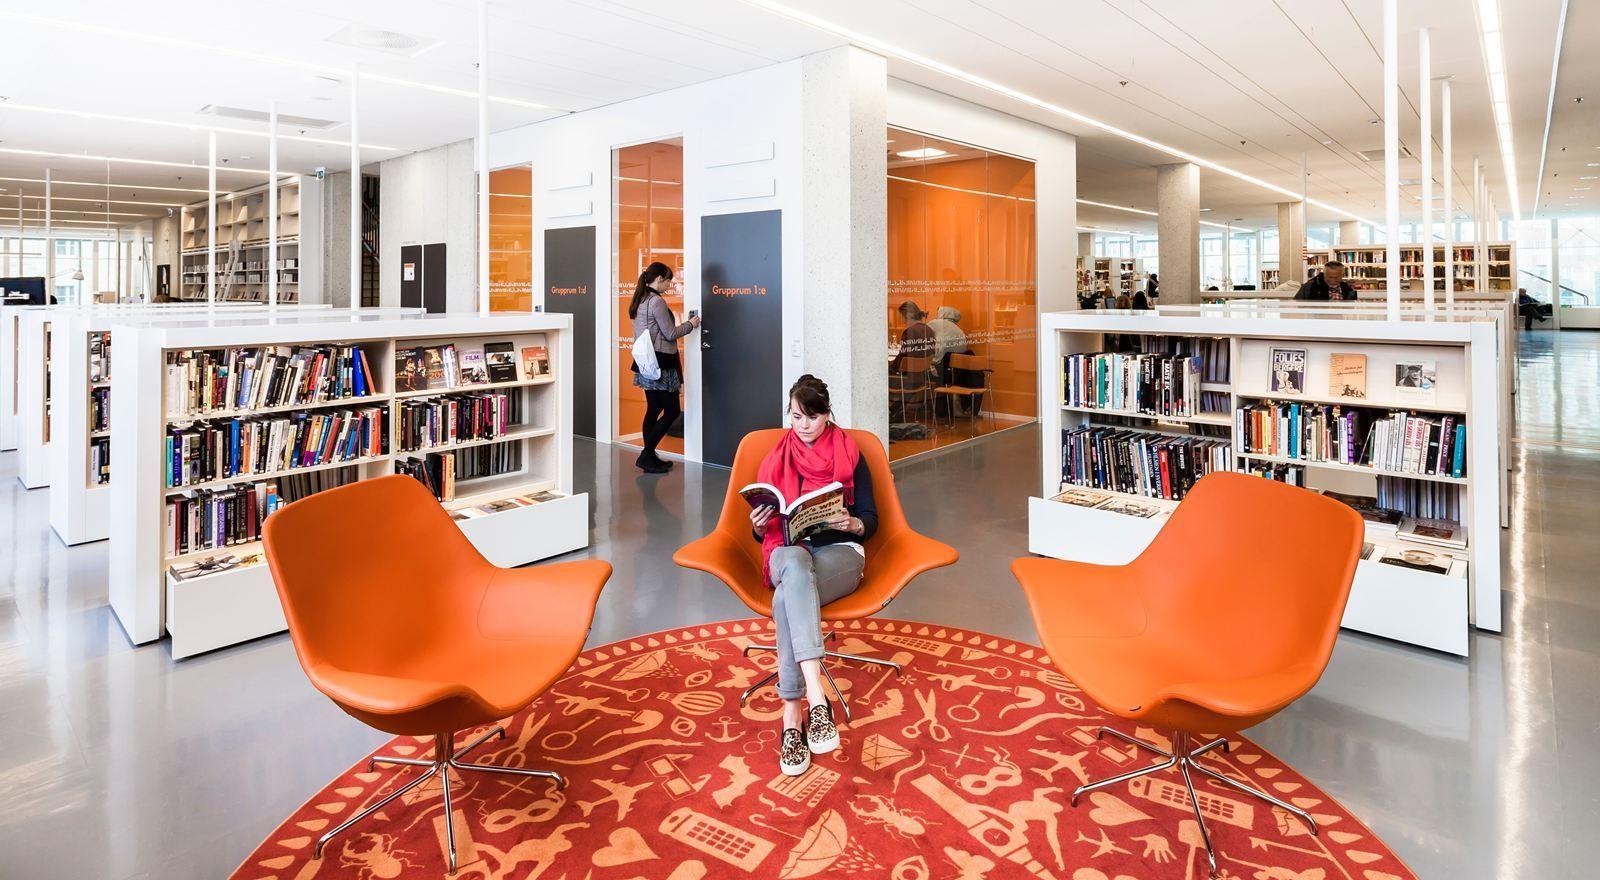 Congratulate, city libraries teen blog